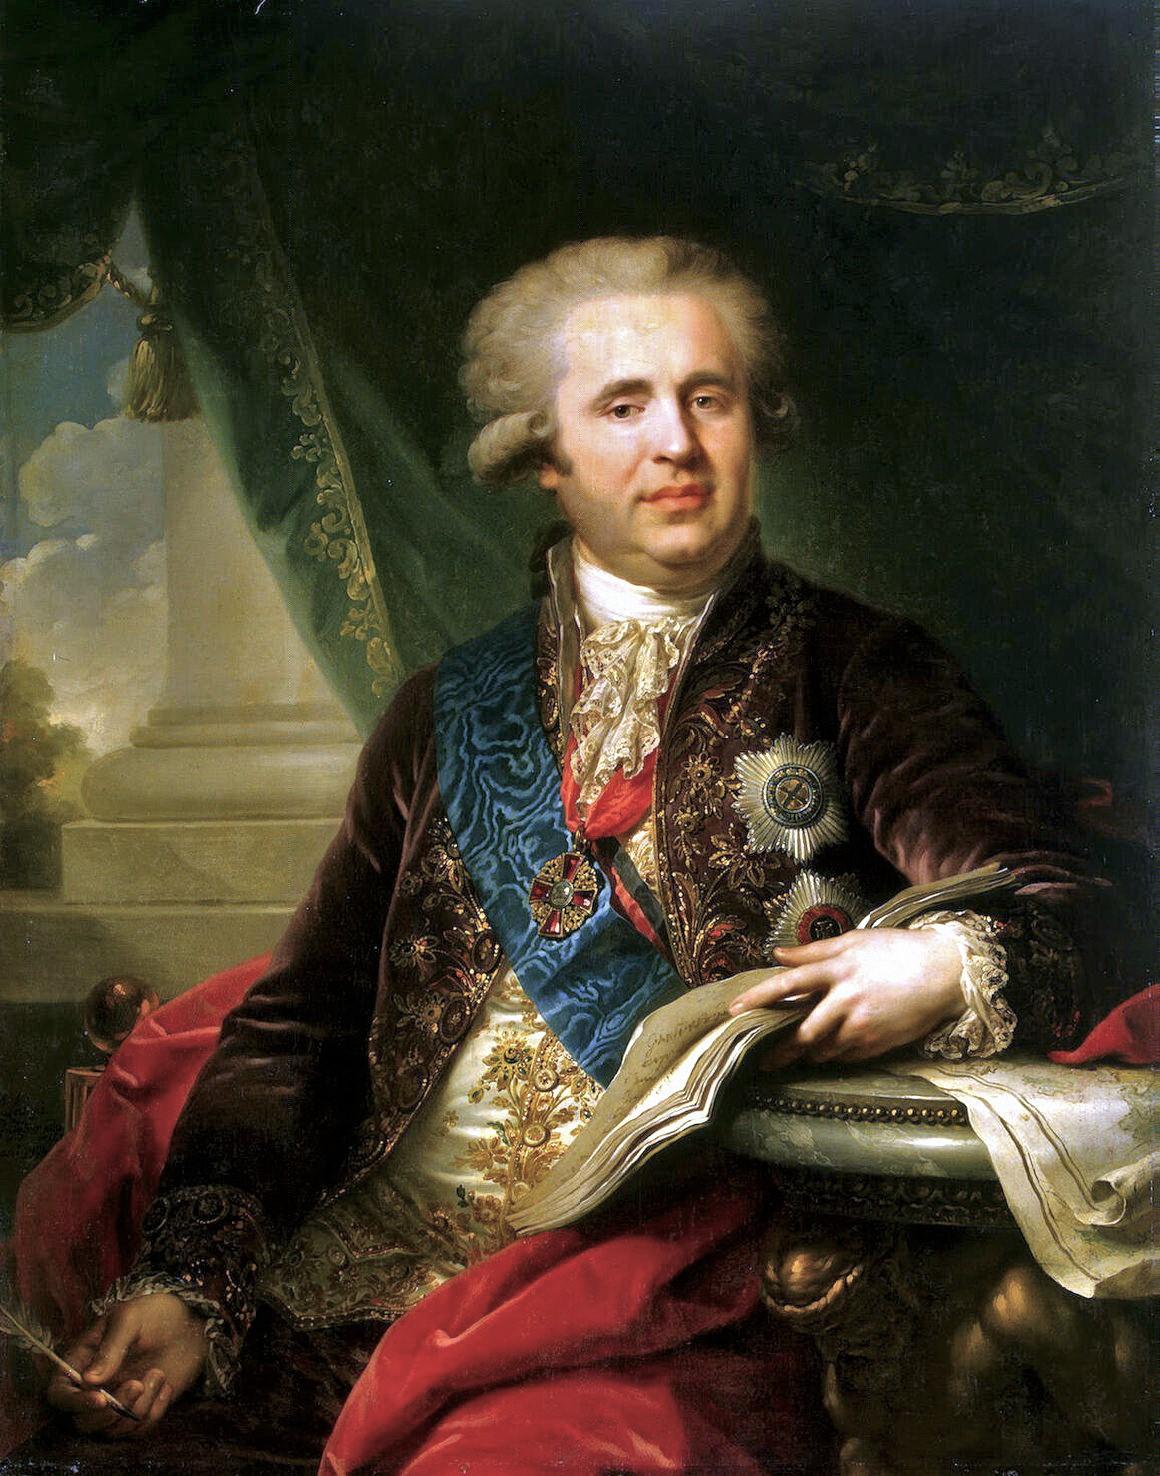 Безбородко, Александр Андреевич